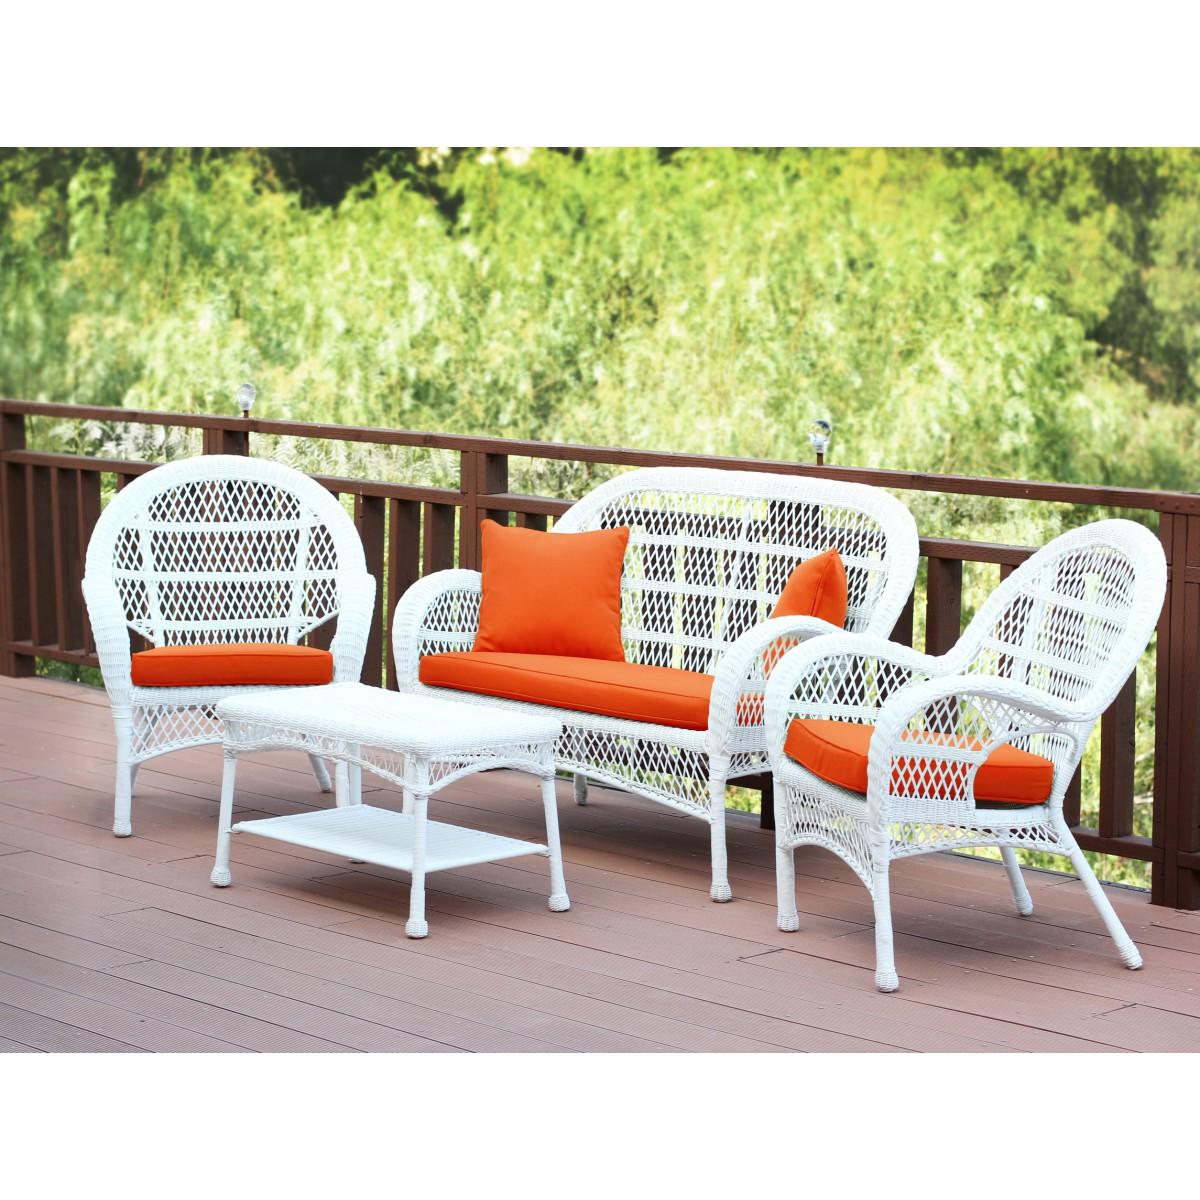 4pc Santa Maria White Wicker Conversation Set Orange Cushions